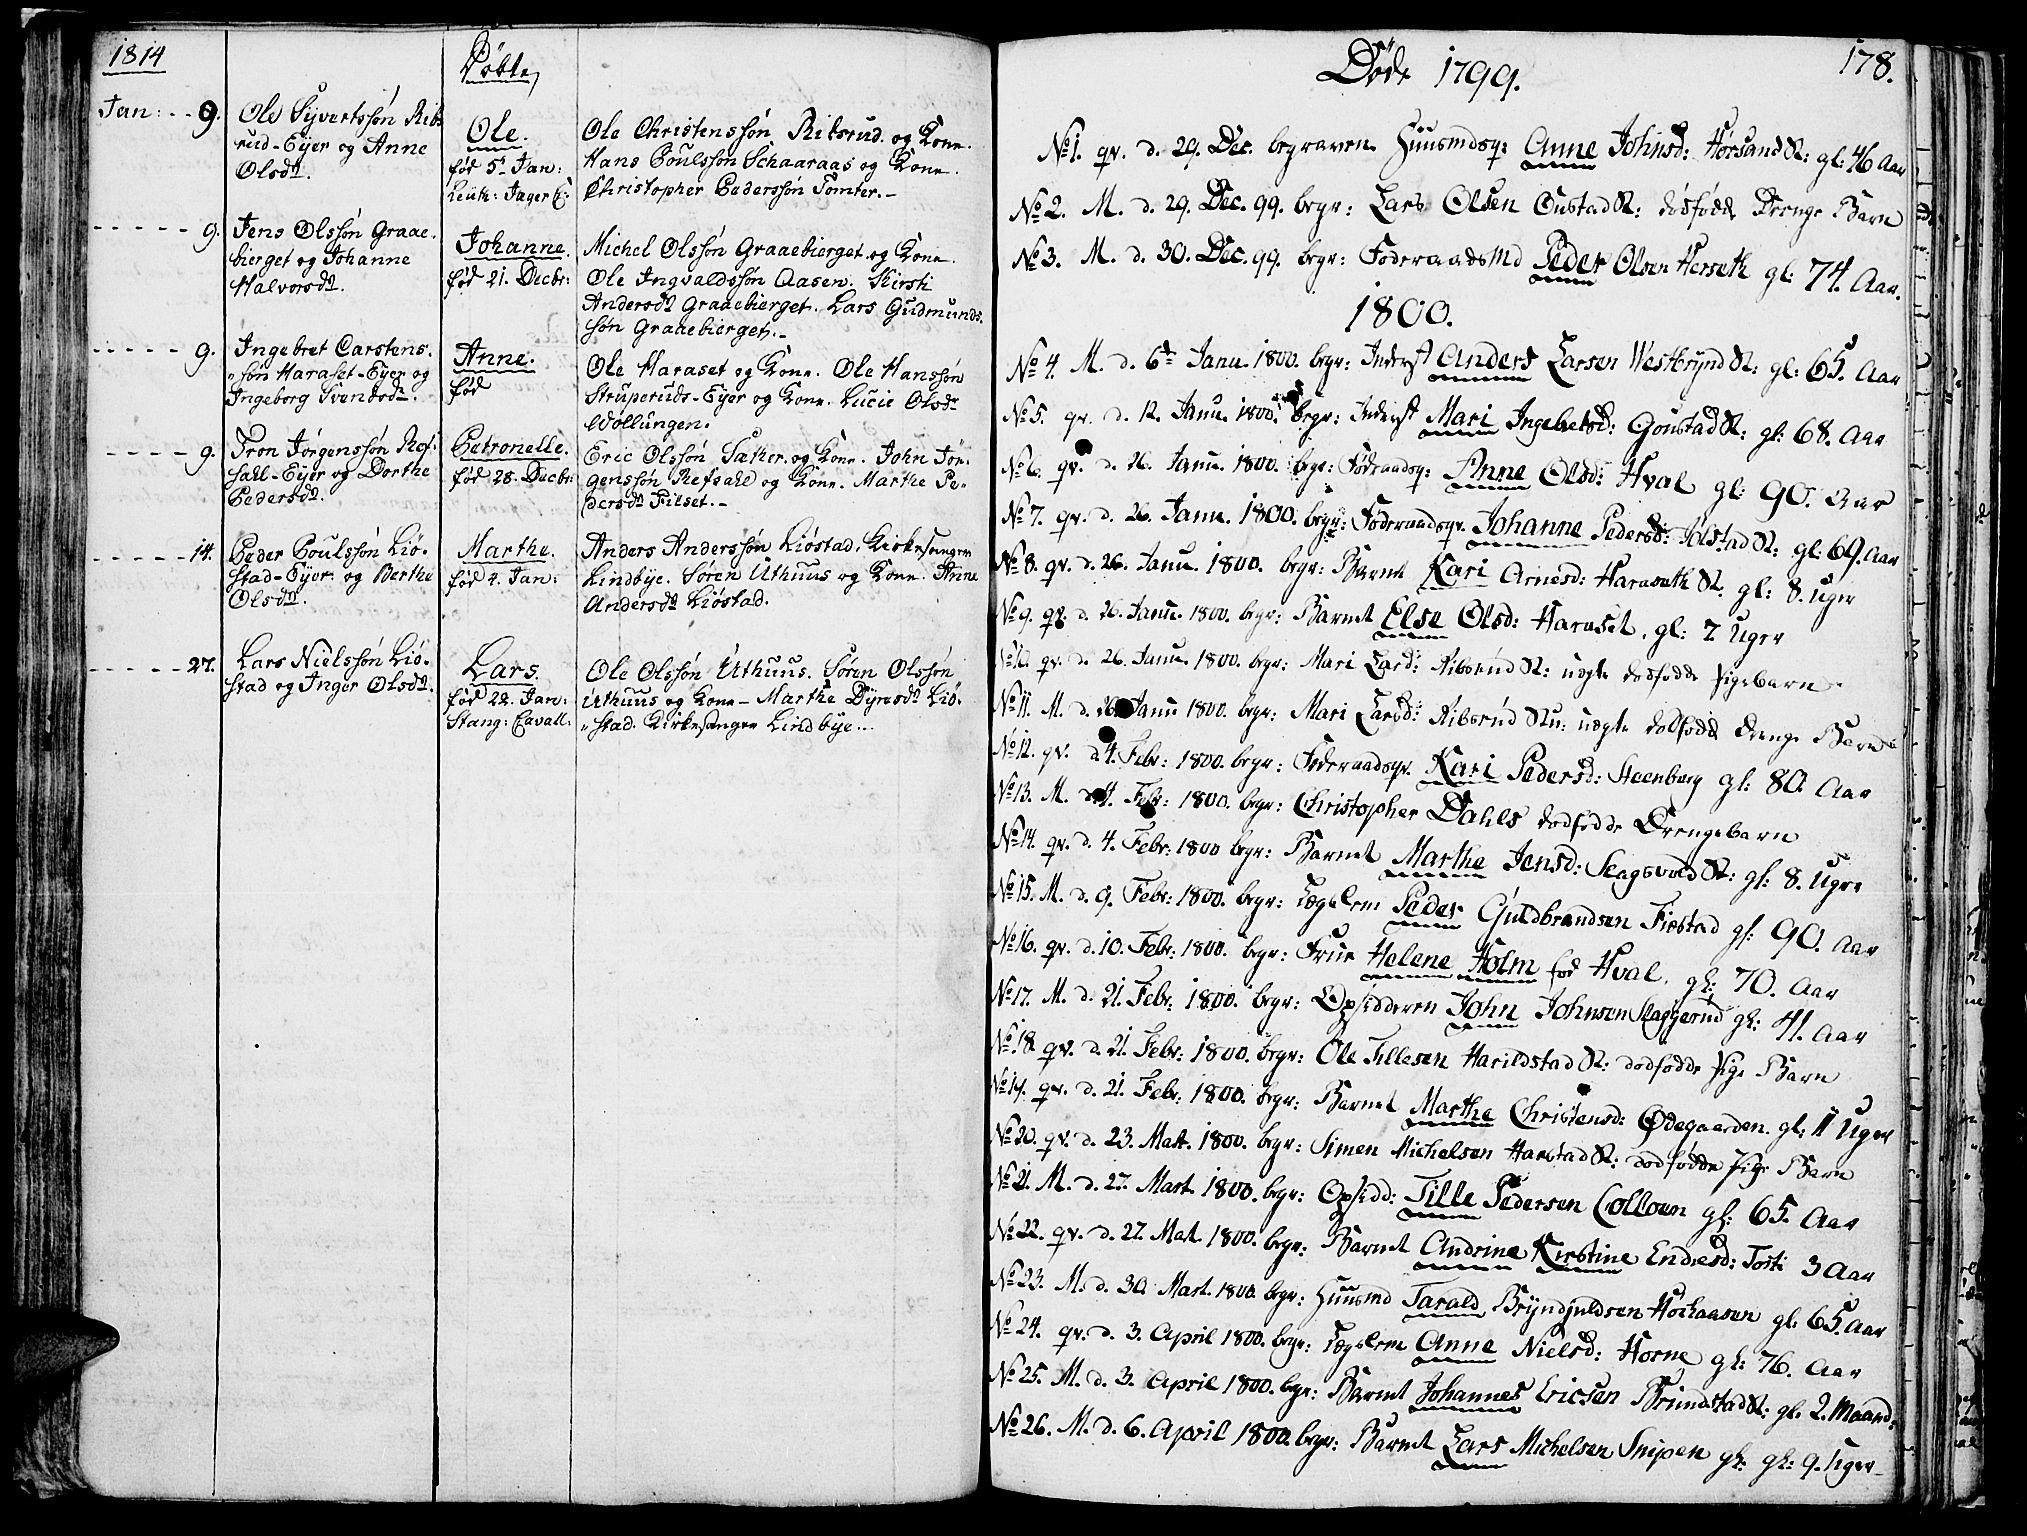 SAH, Romedal prestekontor, K/L0001: Ministerialbok nr. 1, 1799-1814, s. 178